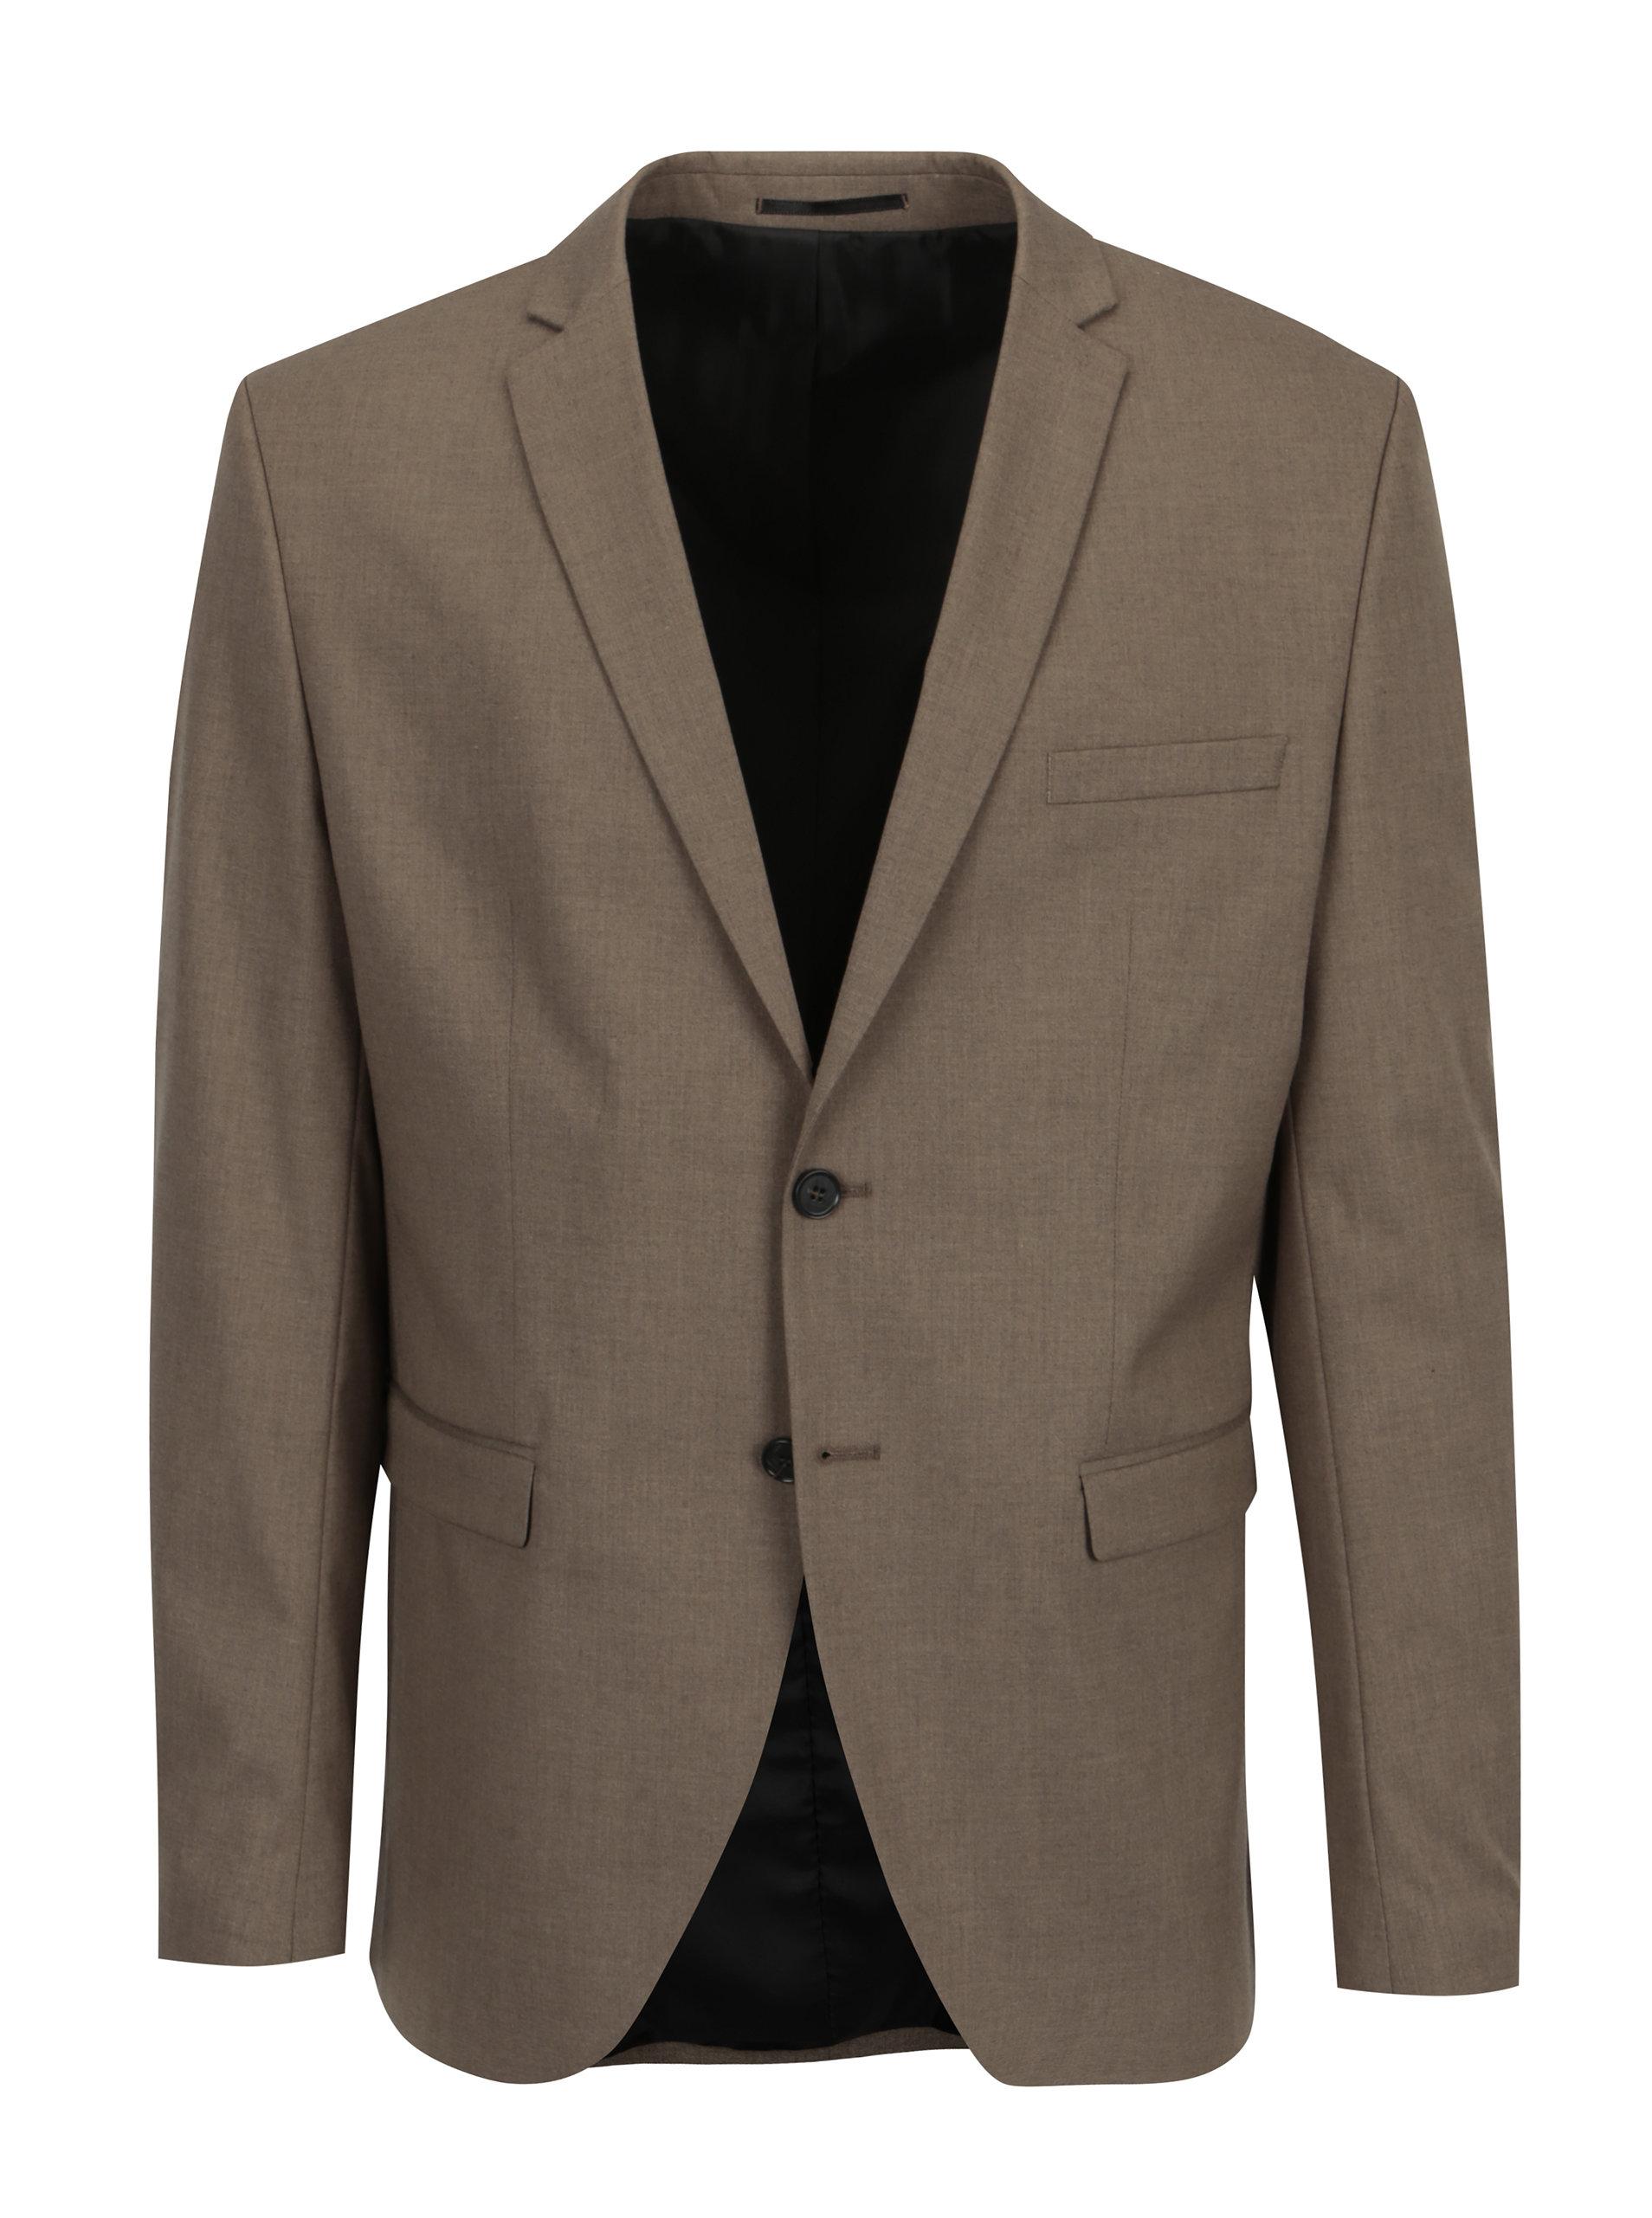 Hnědé oblekové sako Selected Homme New one